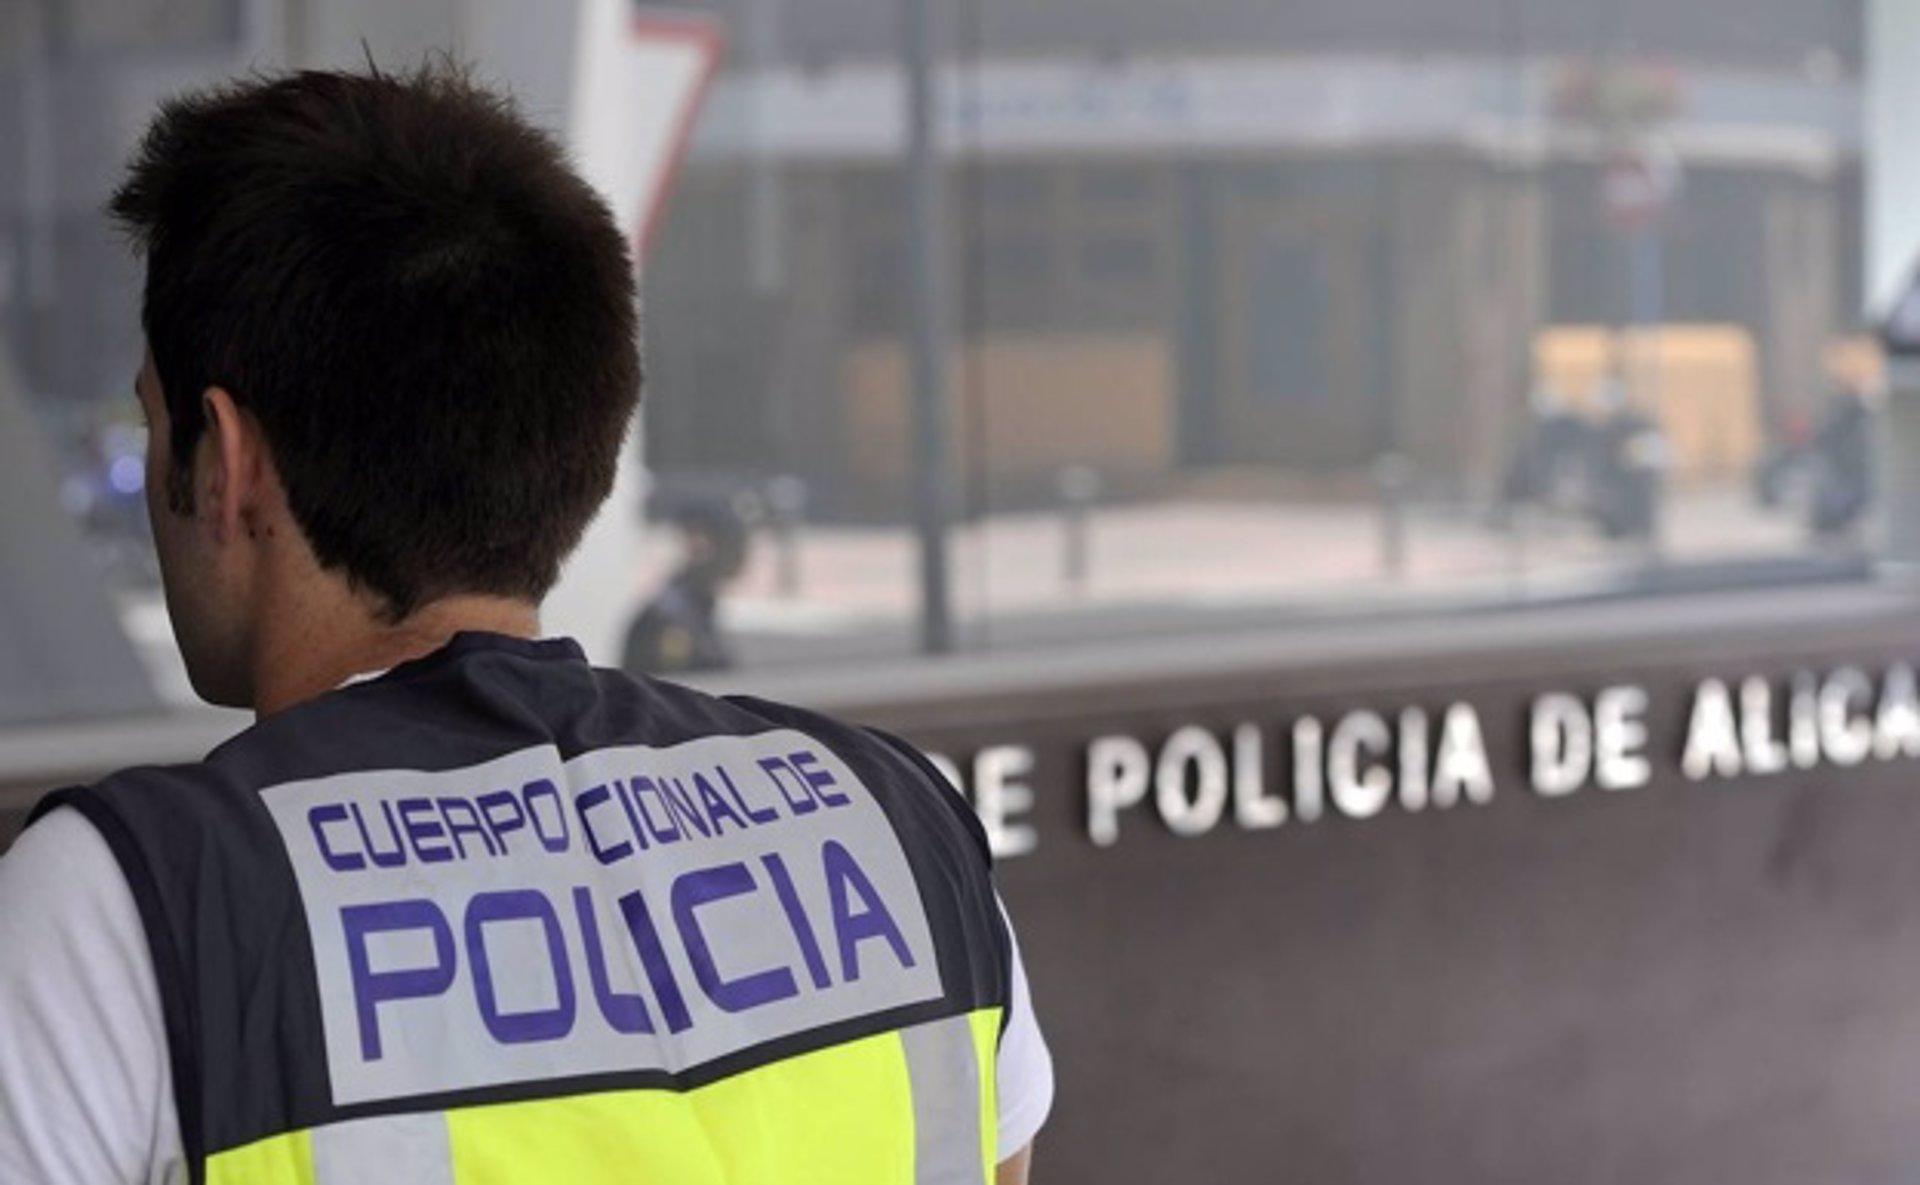 Detenido en Callosa d'En Sarrià un fugitivo reclamado por Francia por tráfico de drogas